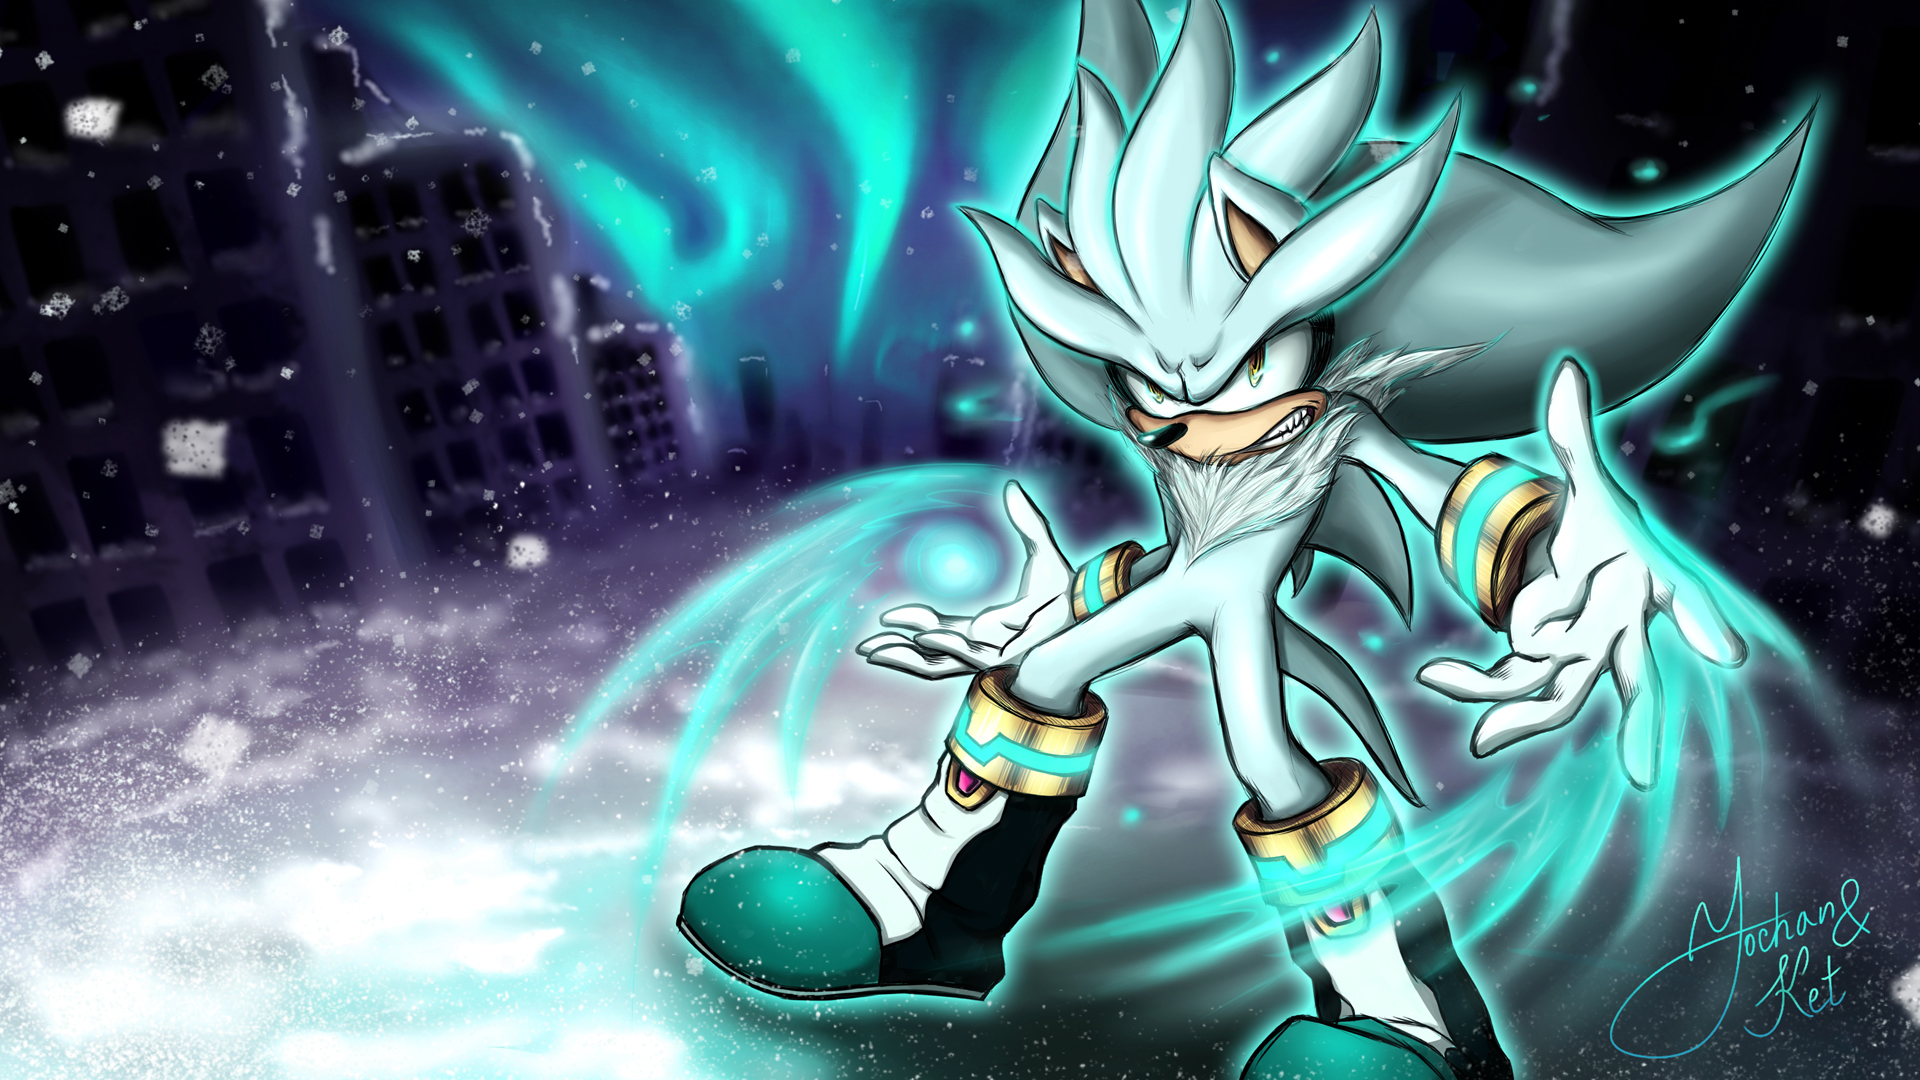 Silvers Rage By KetLike